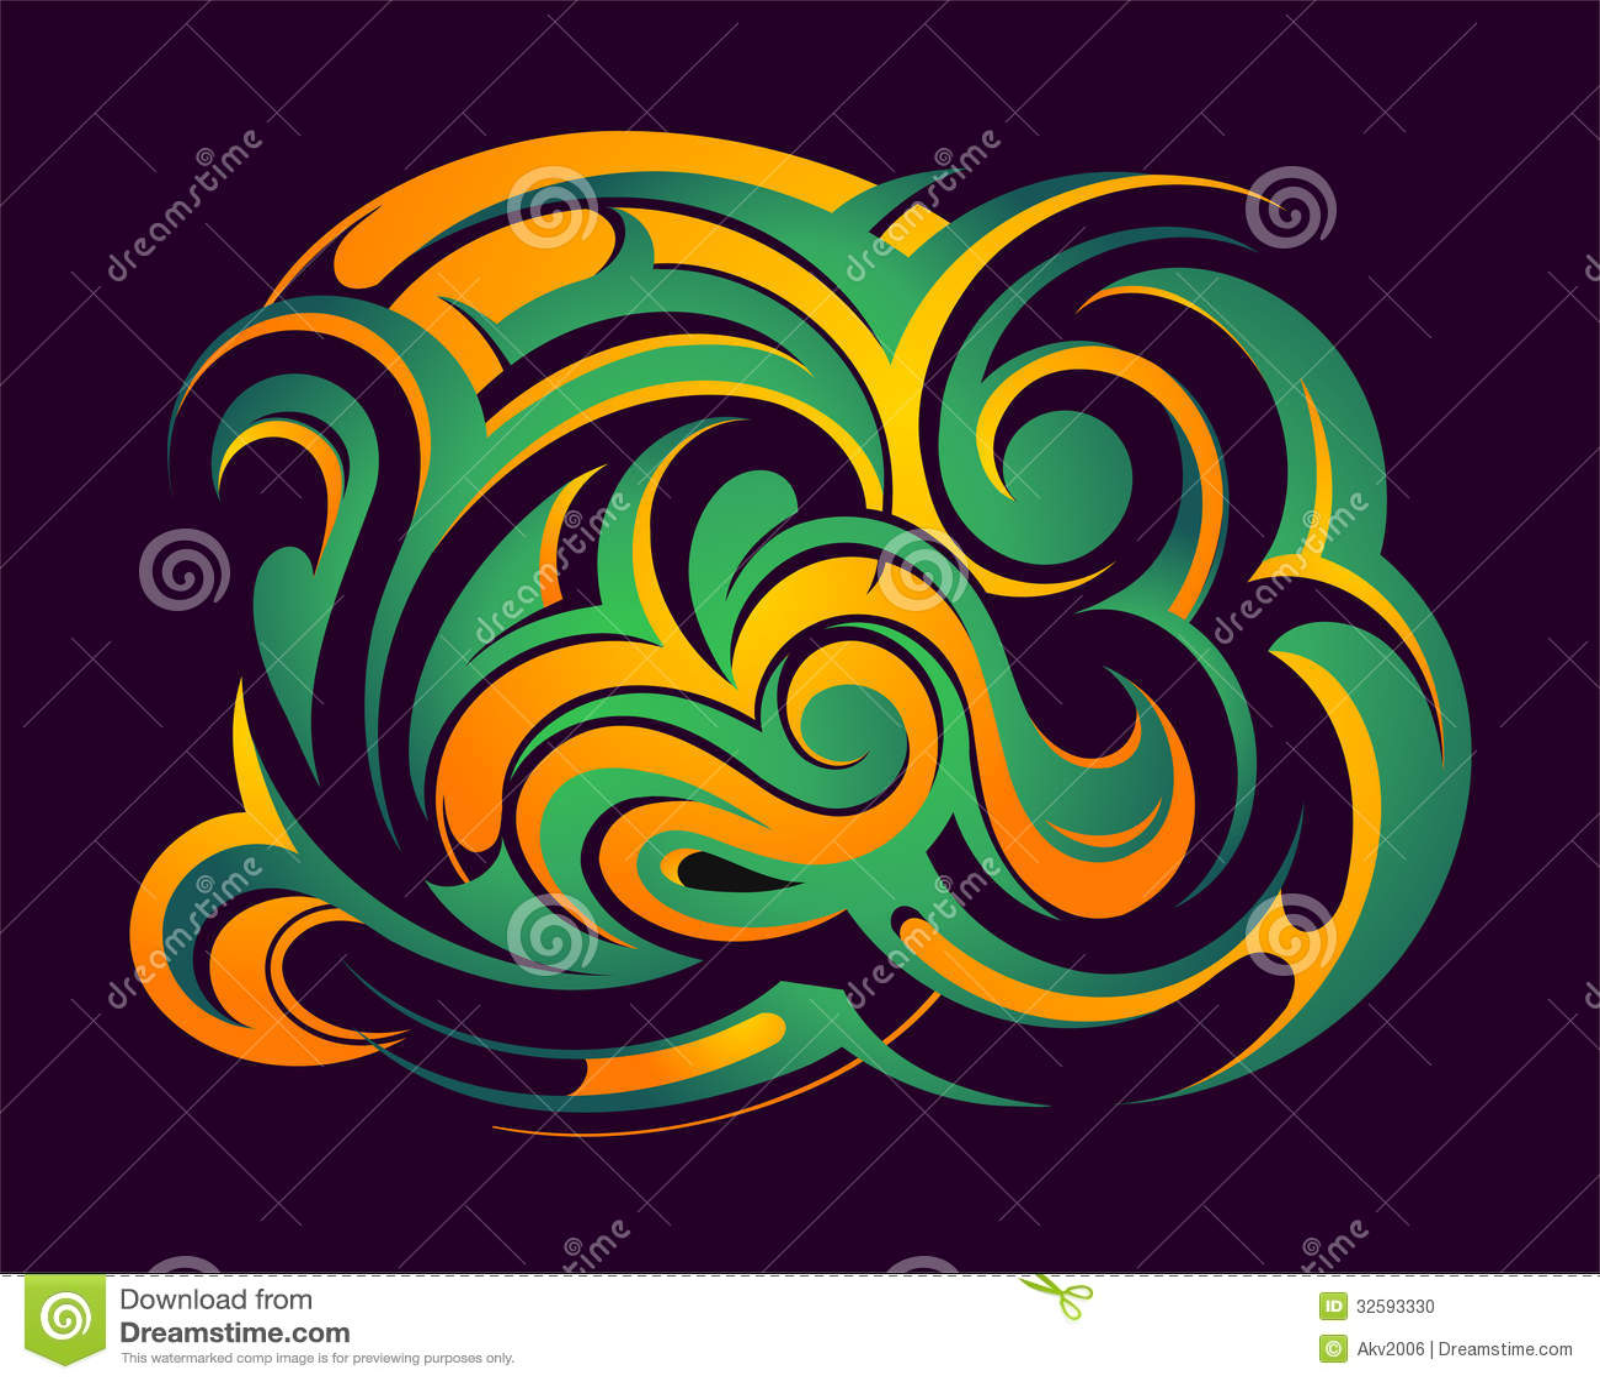 Elements Of Design Shape : Abstract shape stock photo image